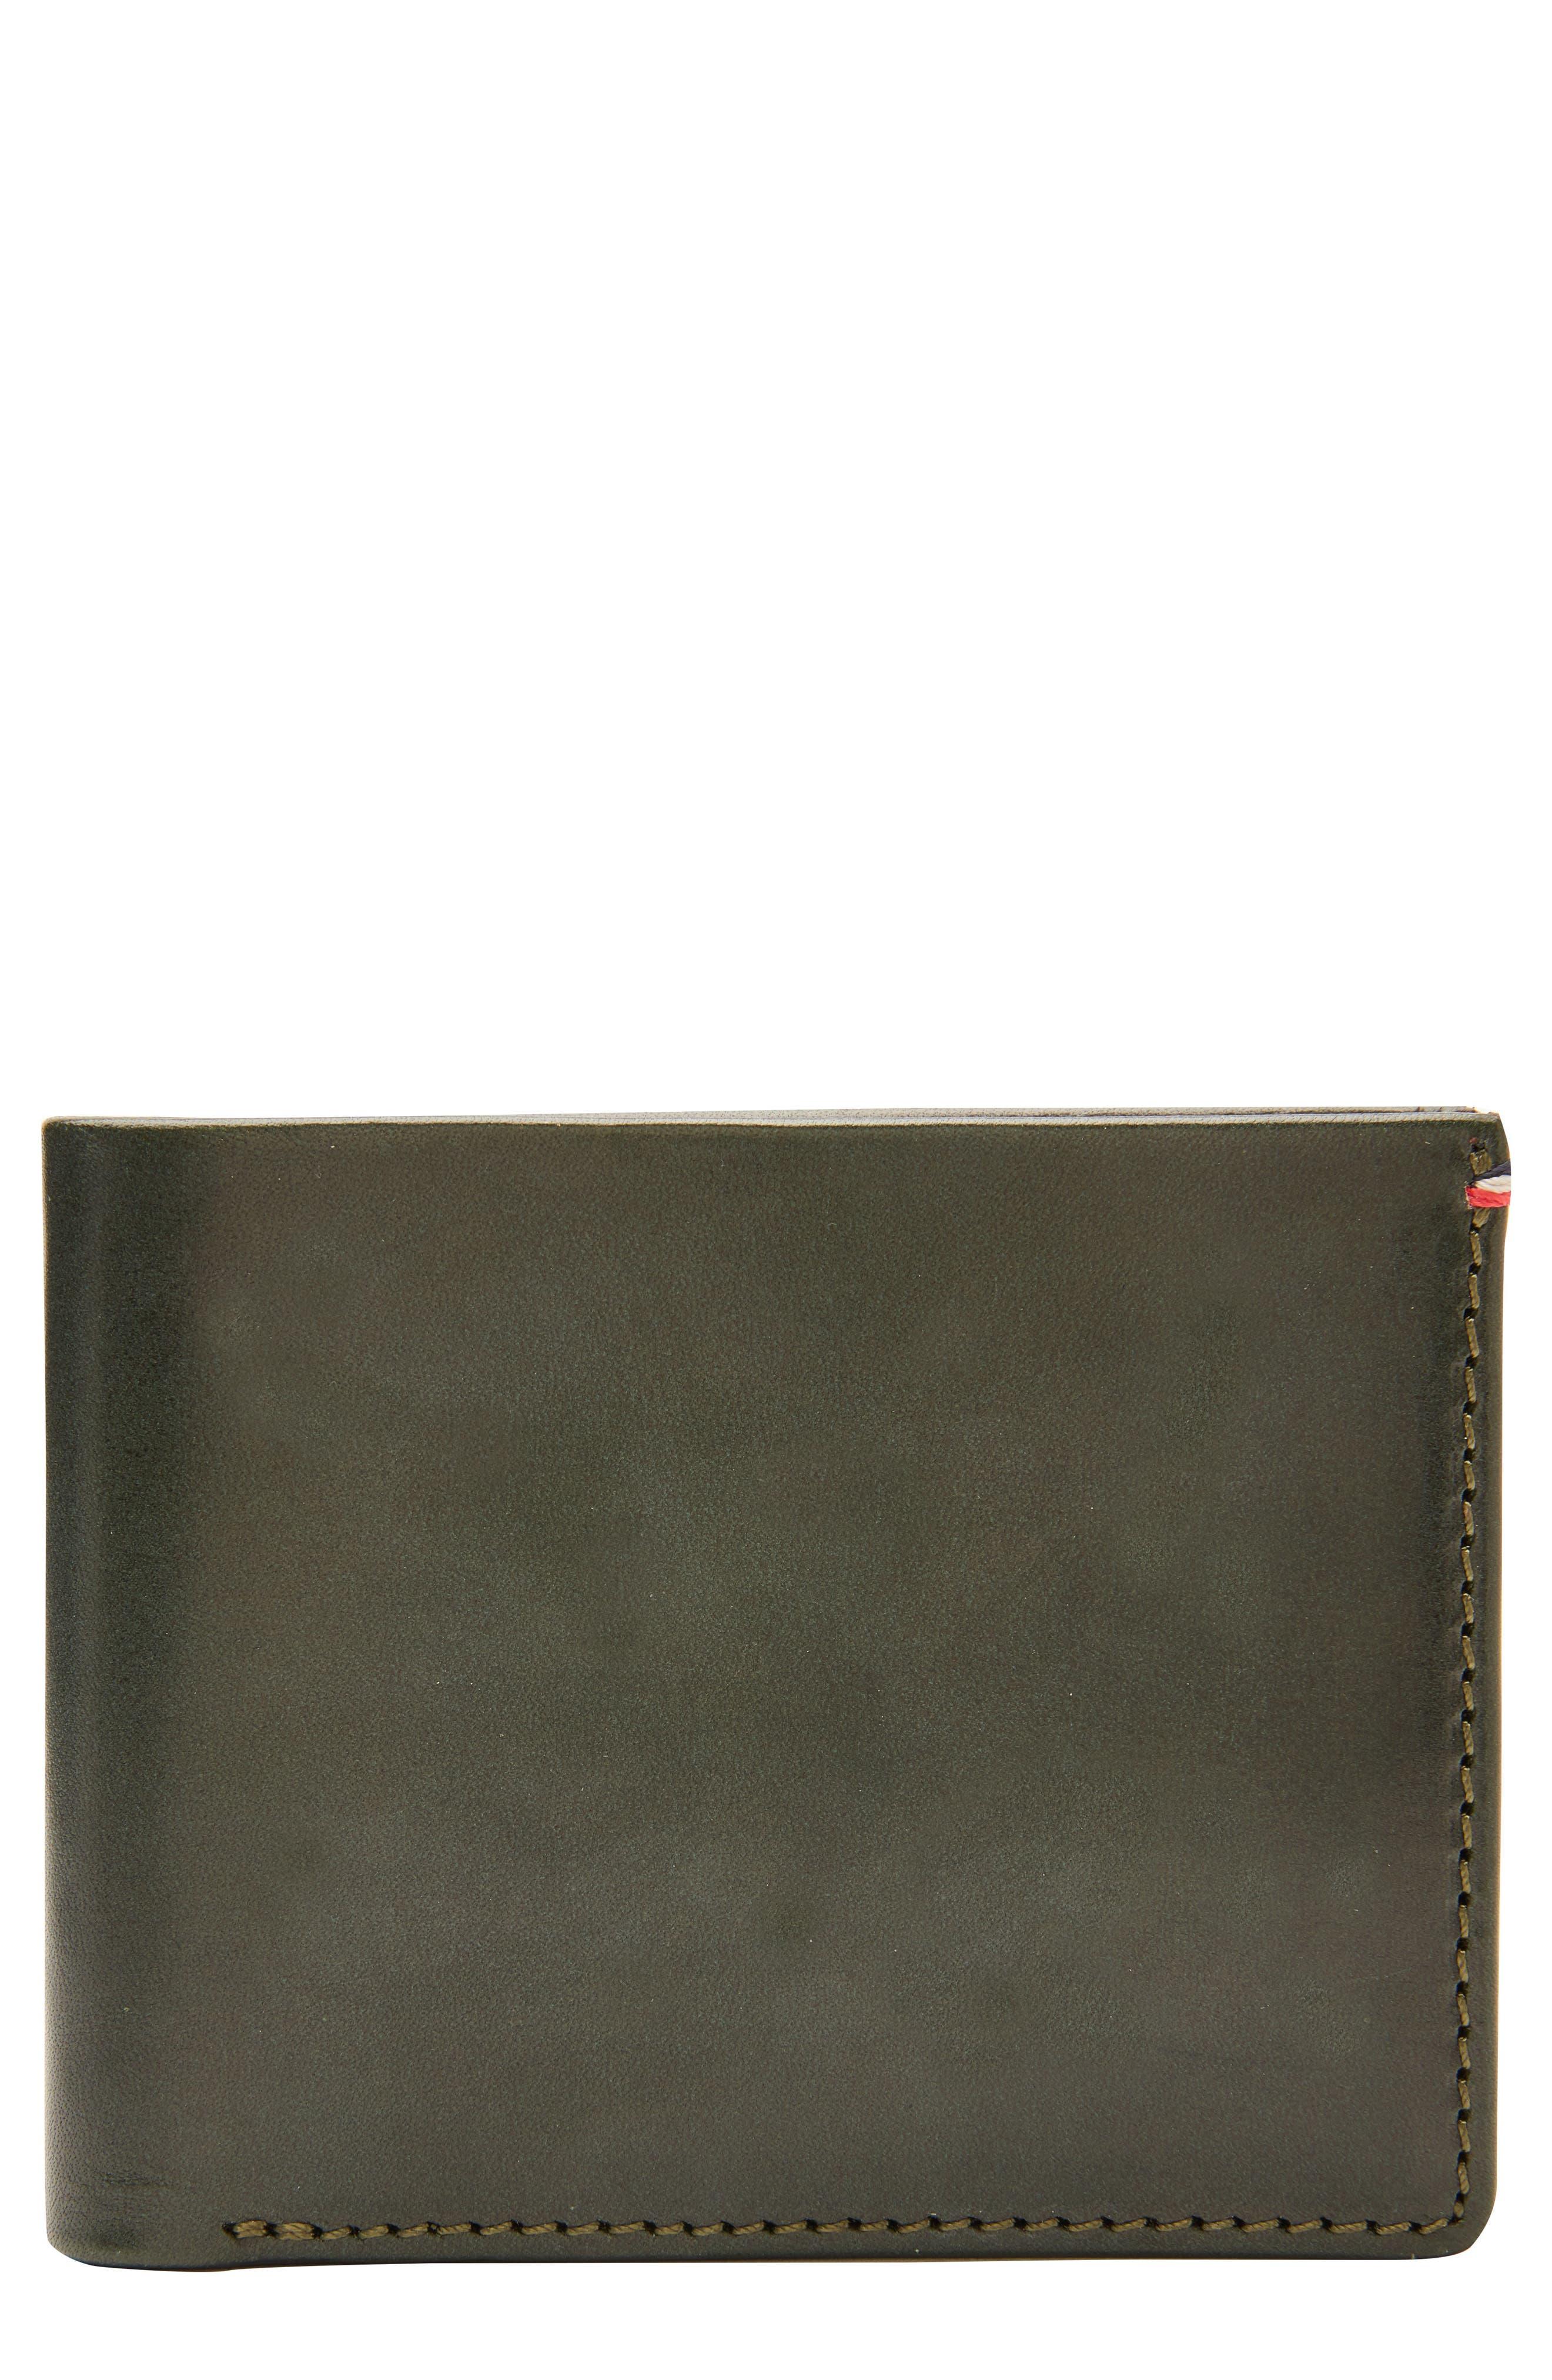 Core Leather Wallet,                             Main thumbnail 1, color,